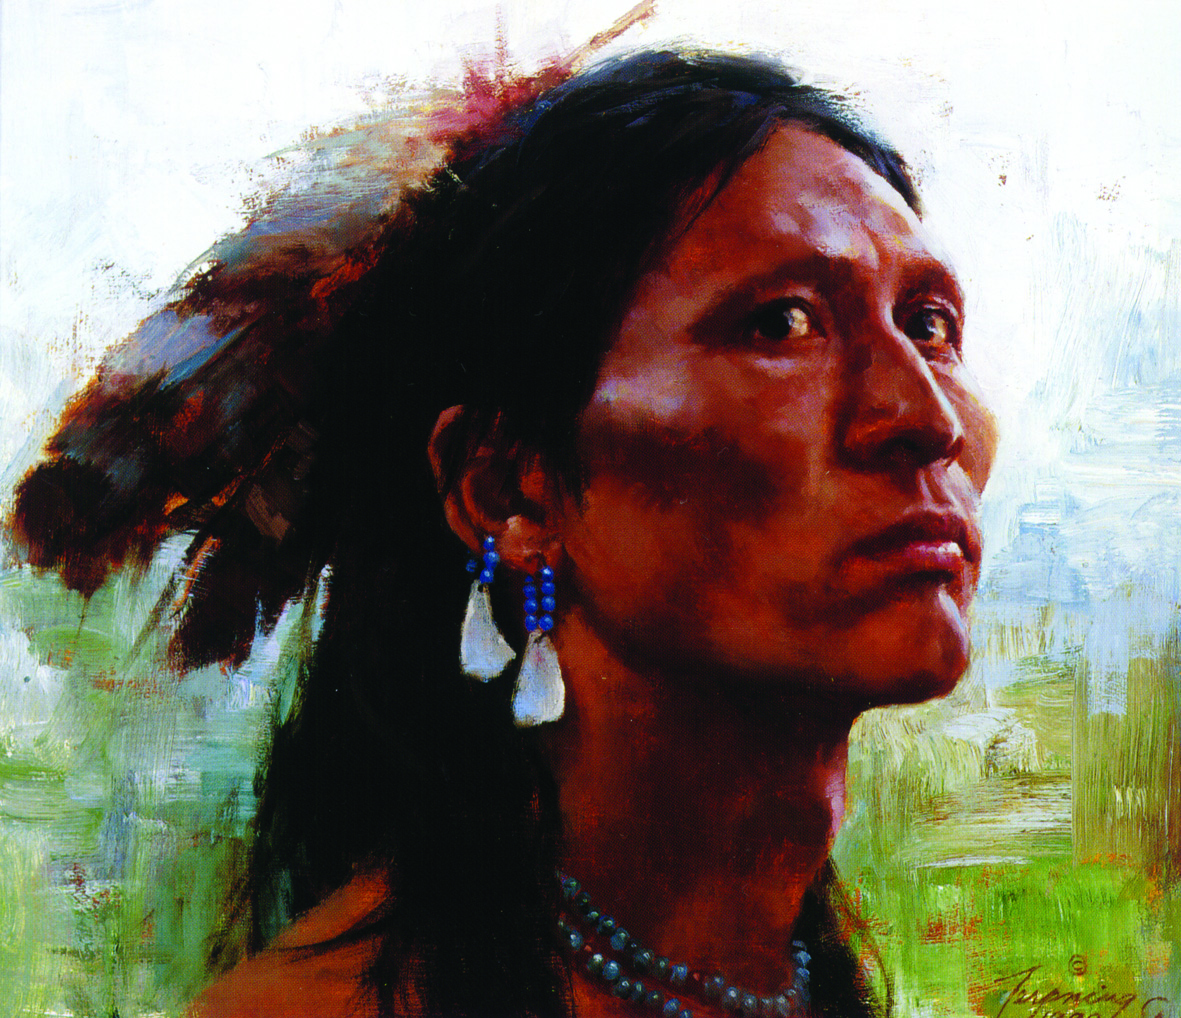 индейцы эротика фото